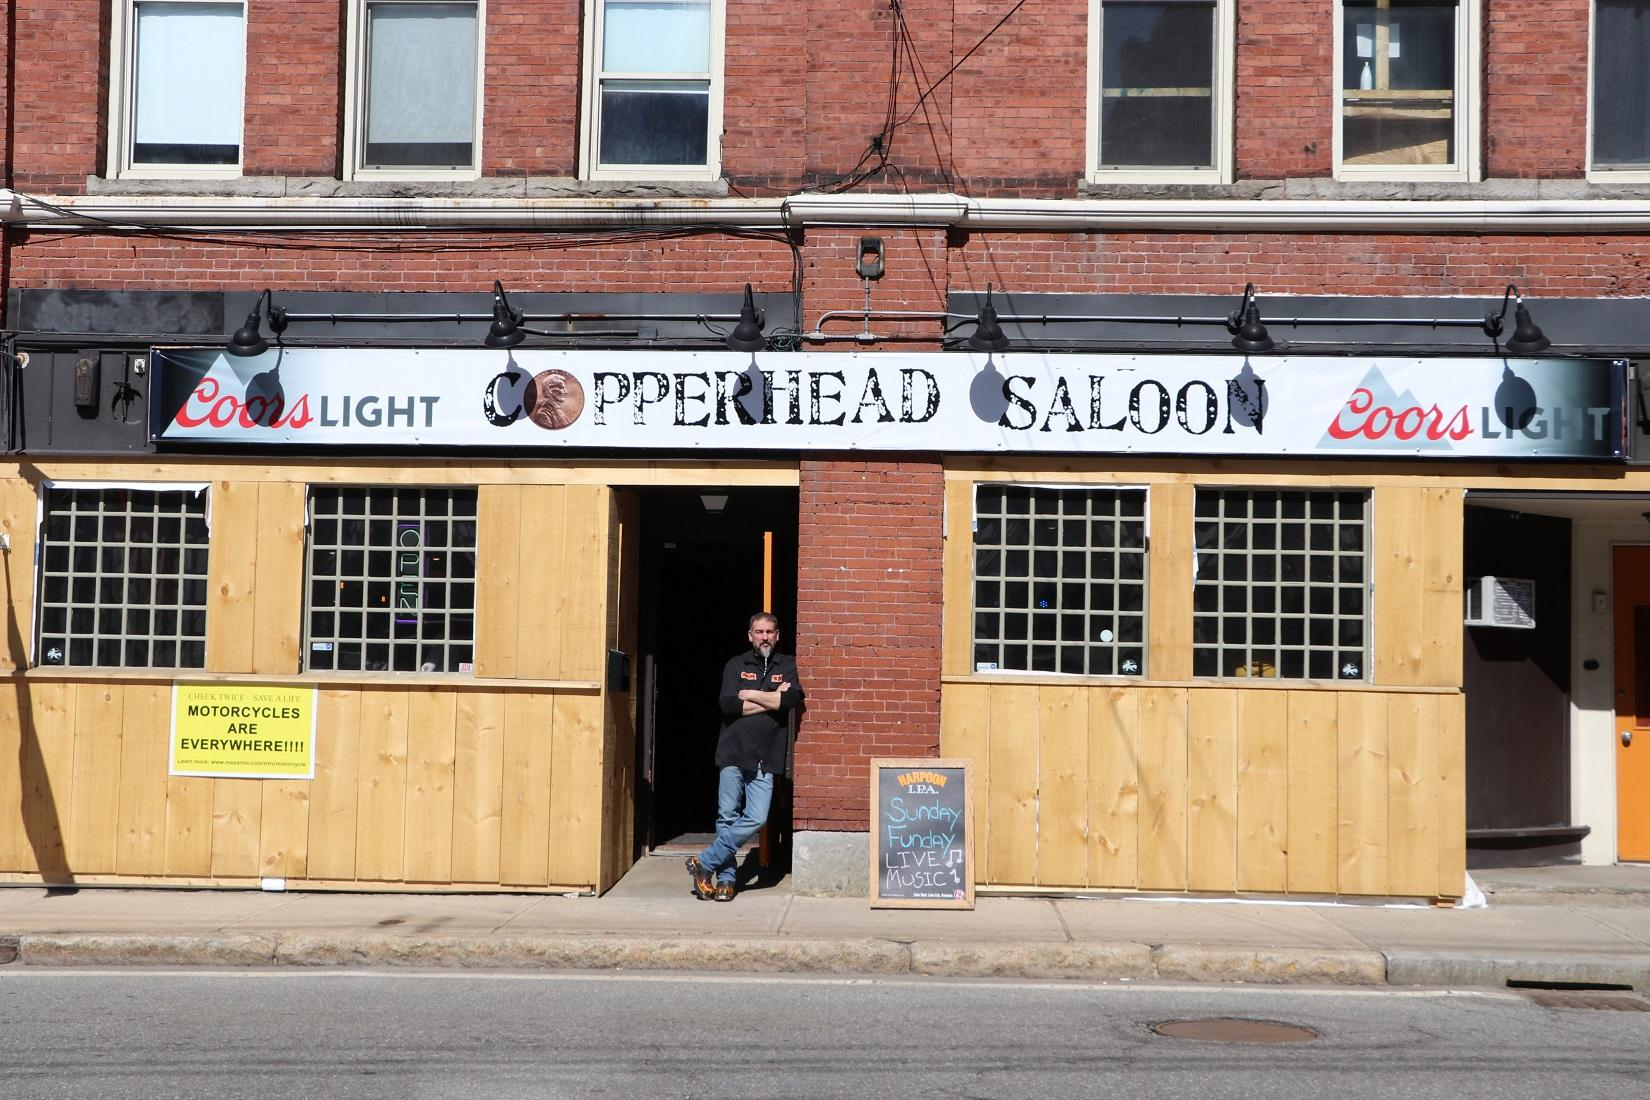 Copperhead Saloon